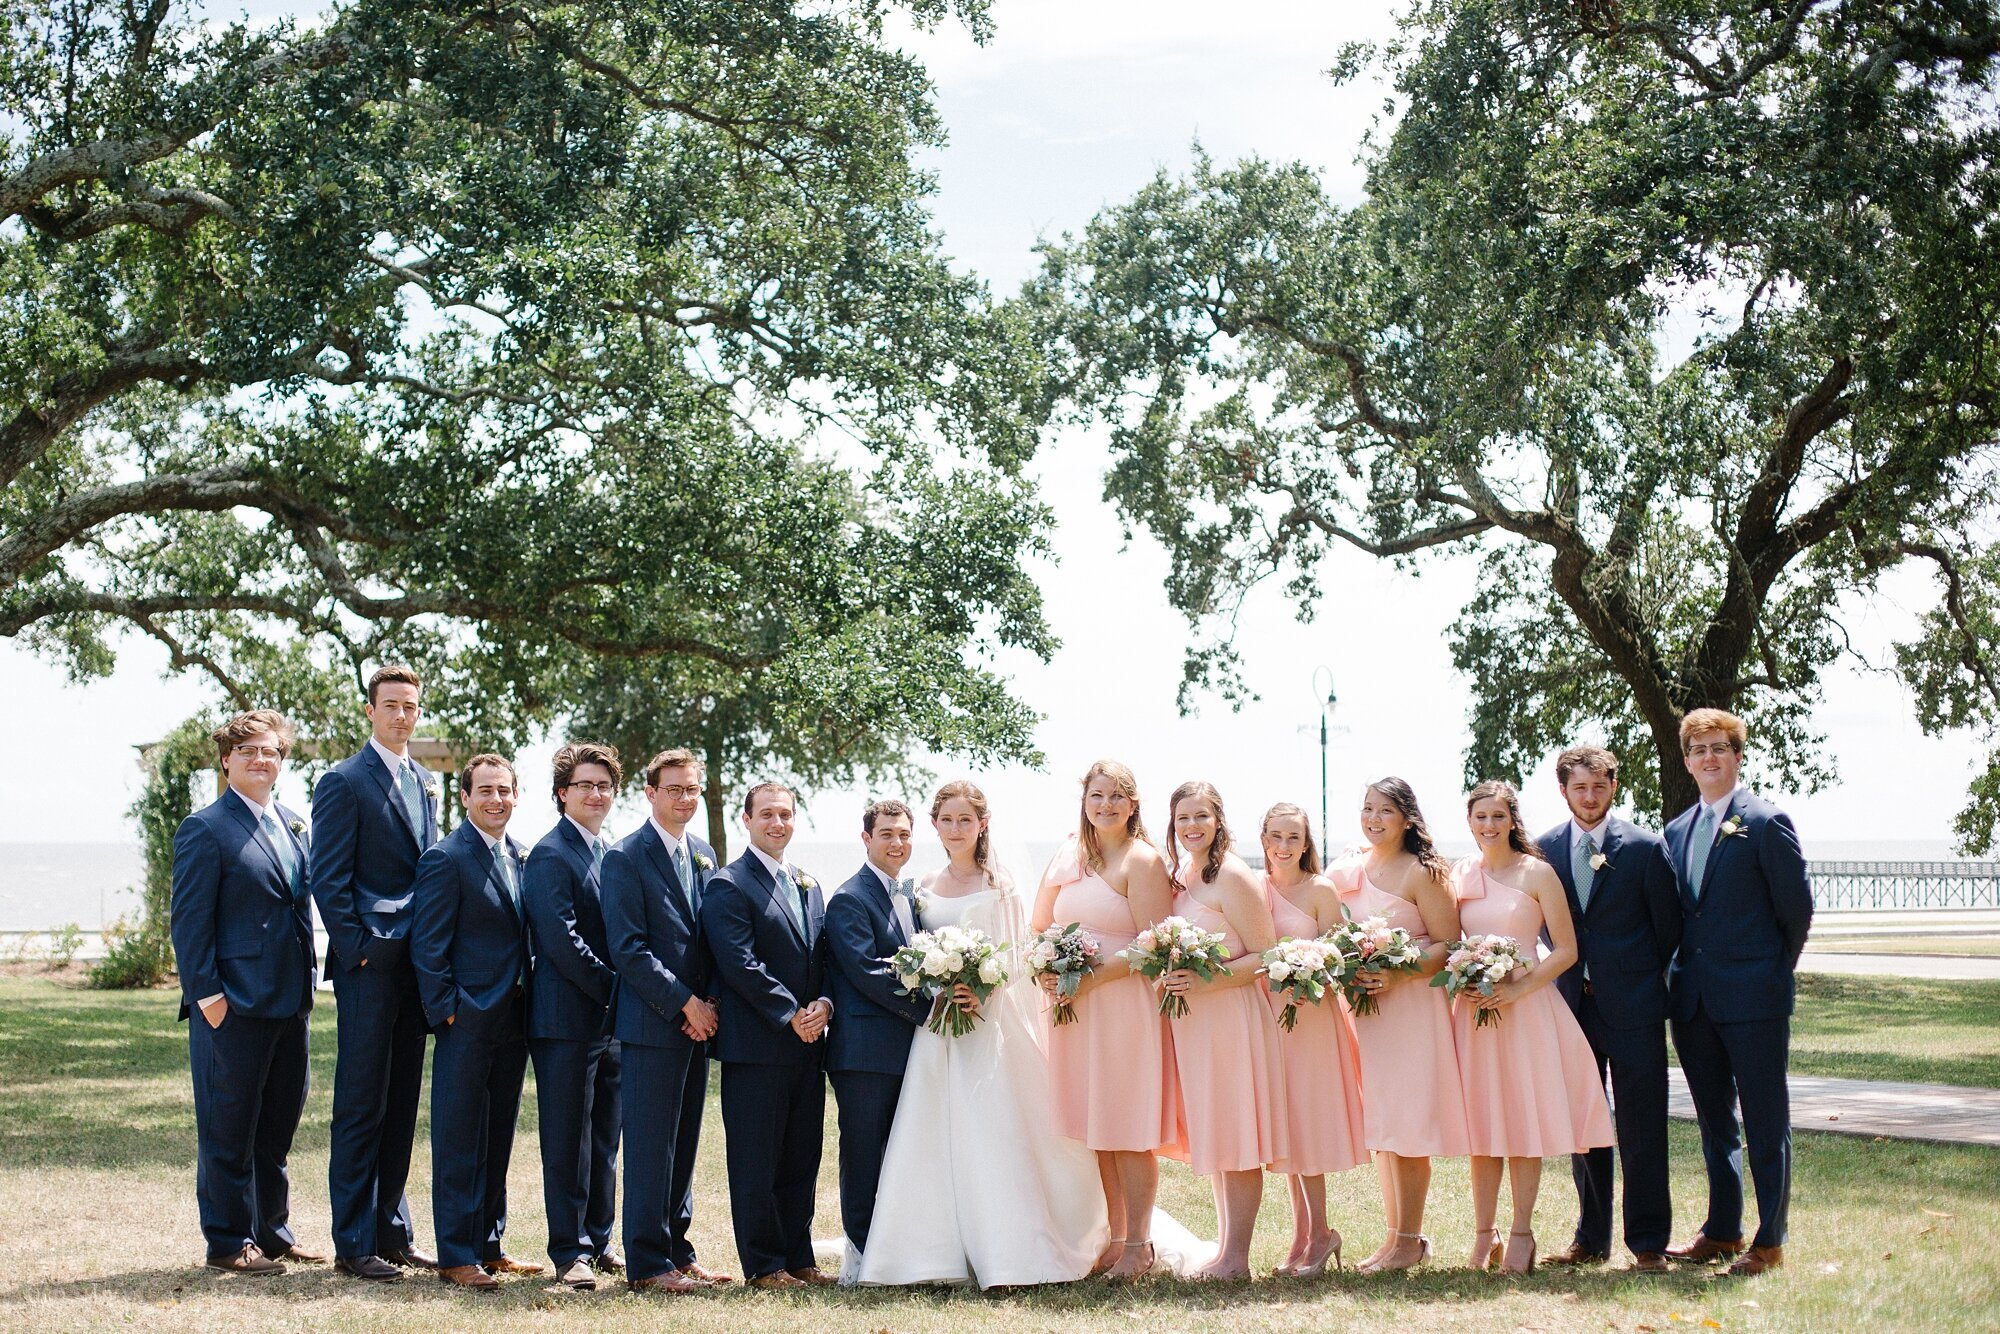 Bay_St_Louis_Wedding_Photographer_0506.jpg